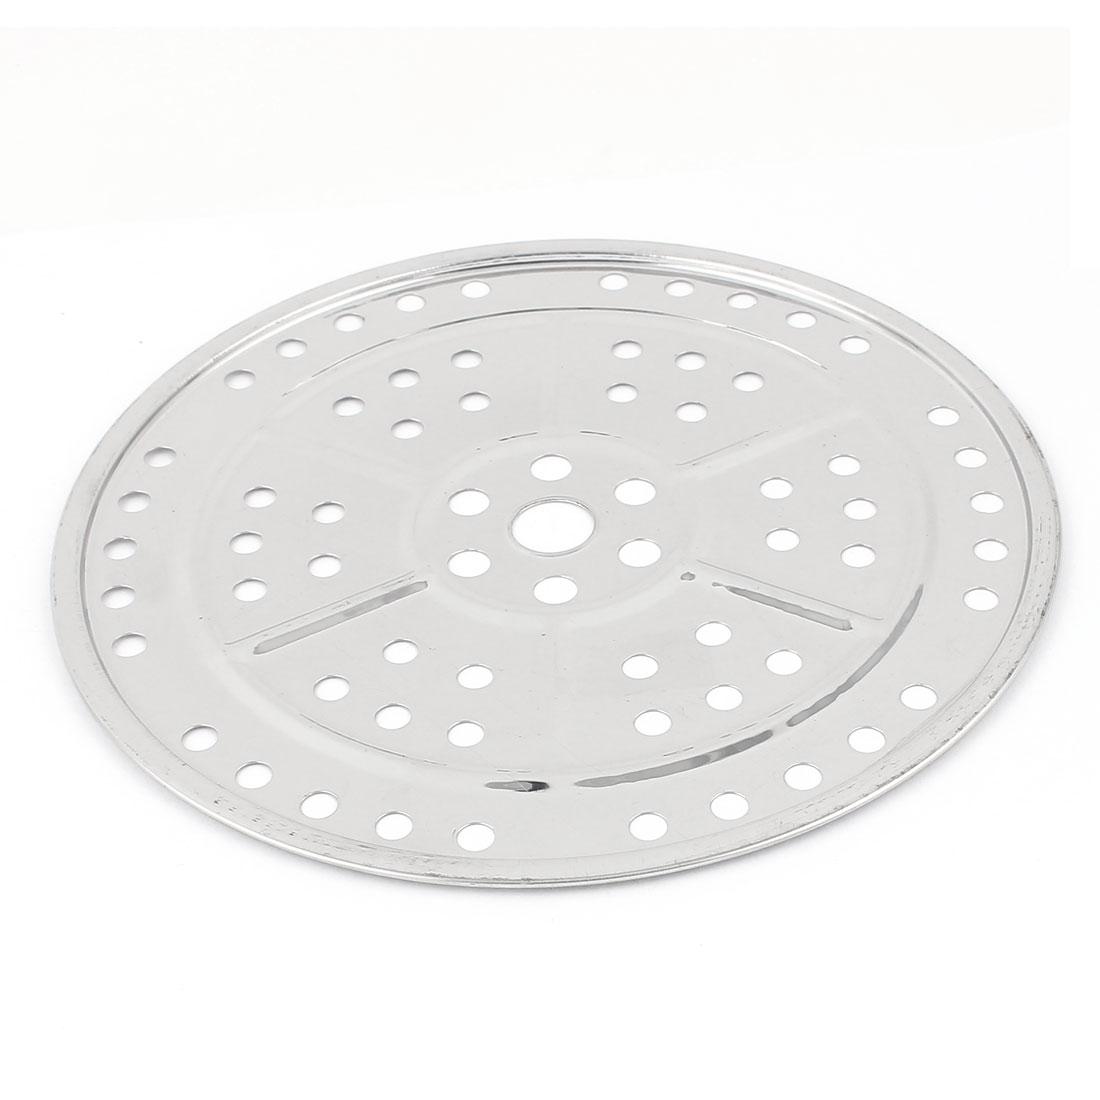 Stockpot Tamales Flour Bun Food Steaming Steamer Rack Insert Plate 24cm Dia